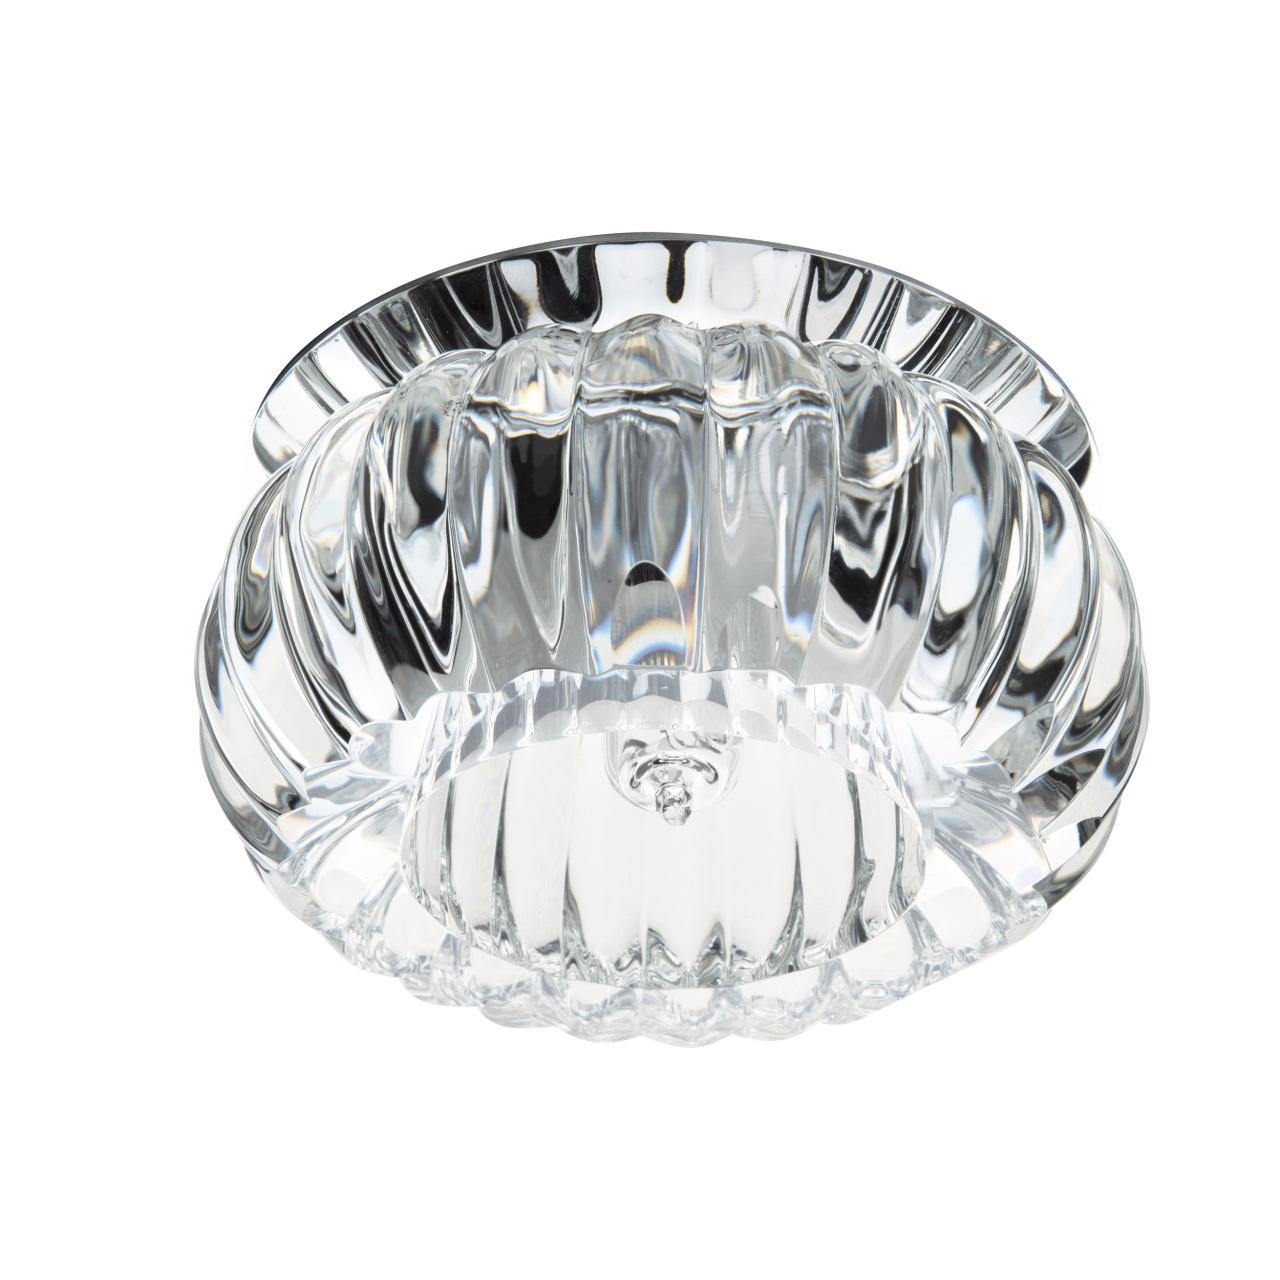 Светильник Trito хром / прозрачный Lightstar 004344